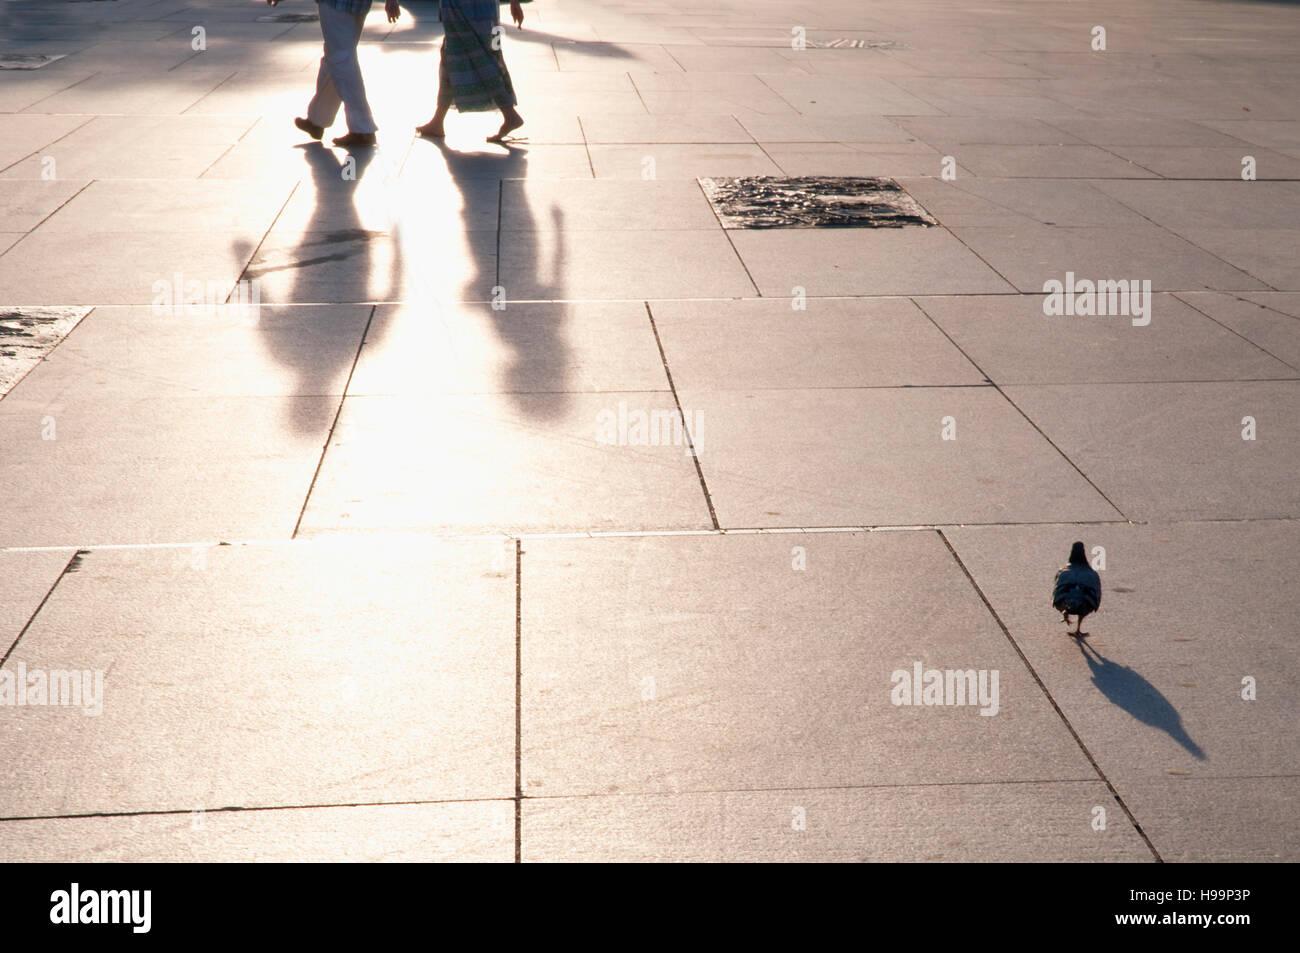 Las sombras sobre el pavimento. Avenida Felipe II, Madrid, España. Imagen De Stock